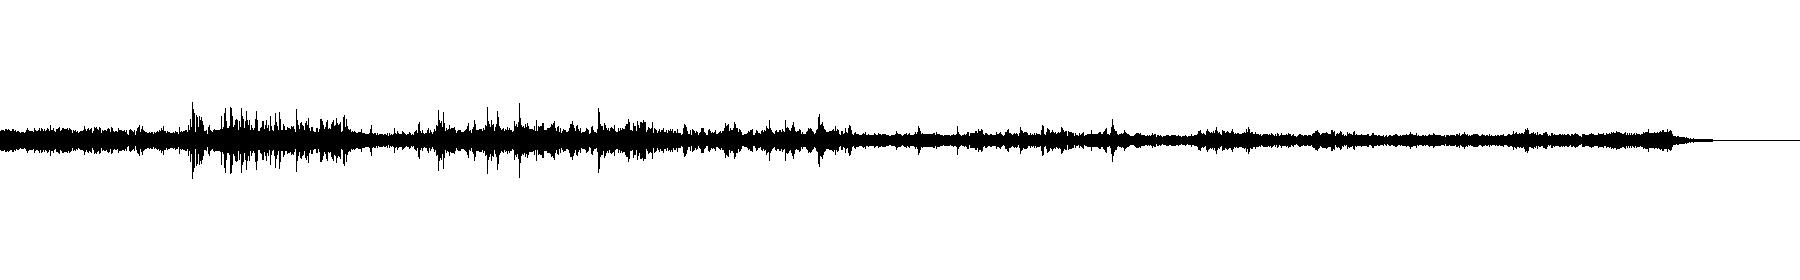 nyc atmospheric field recording